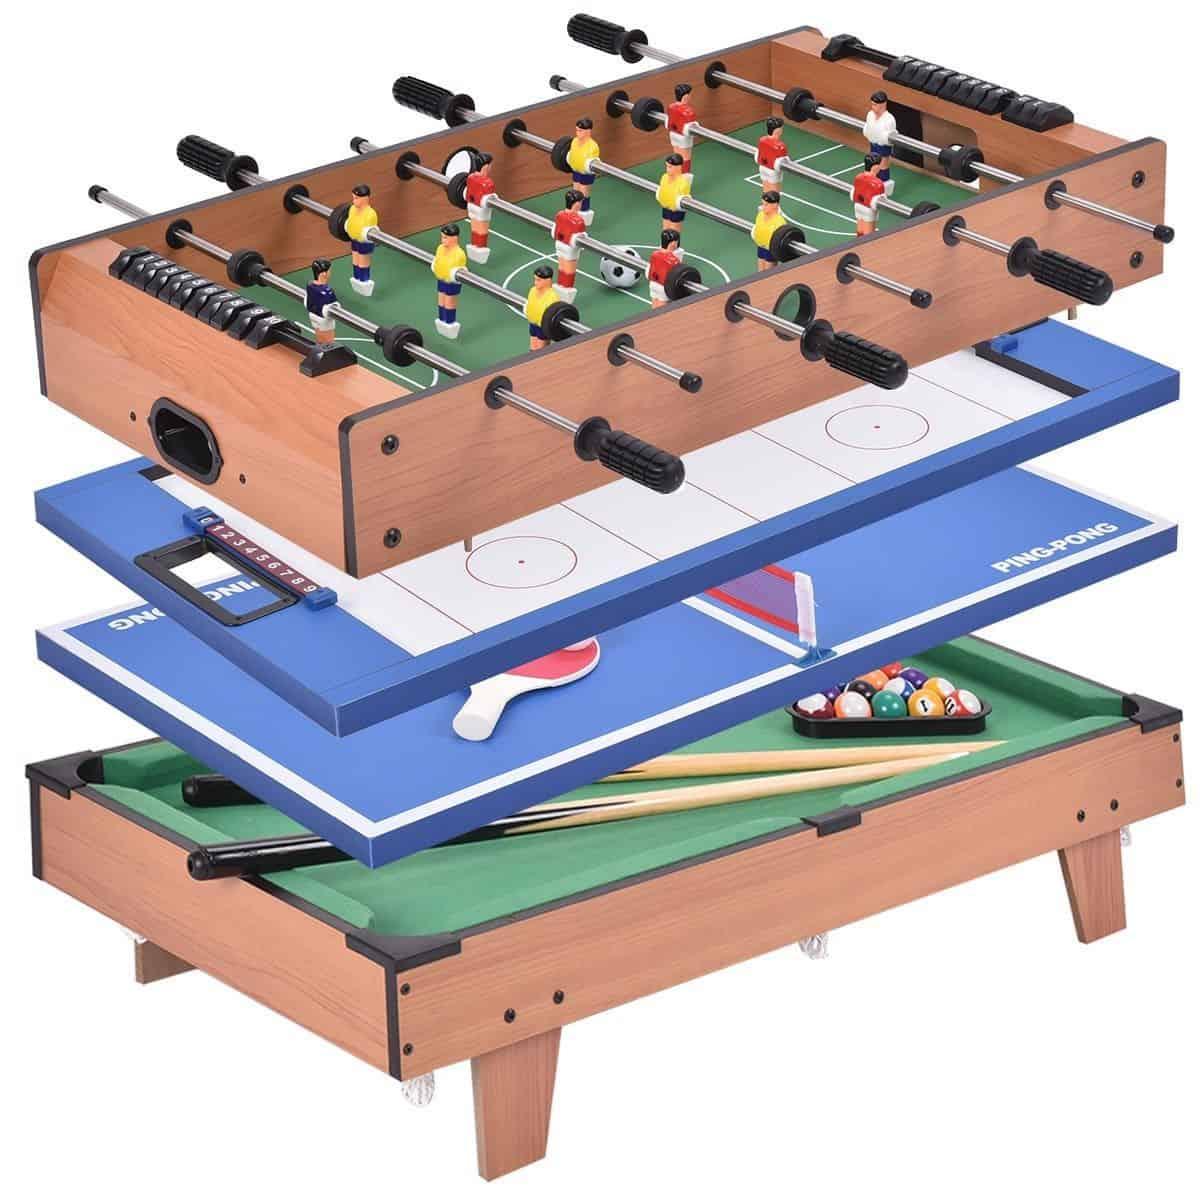 Game Table on www.girllovesglam.com